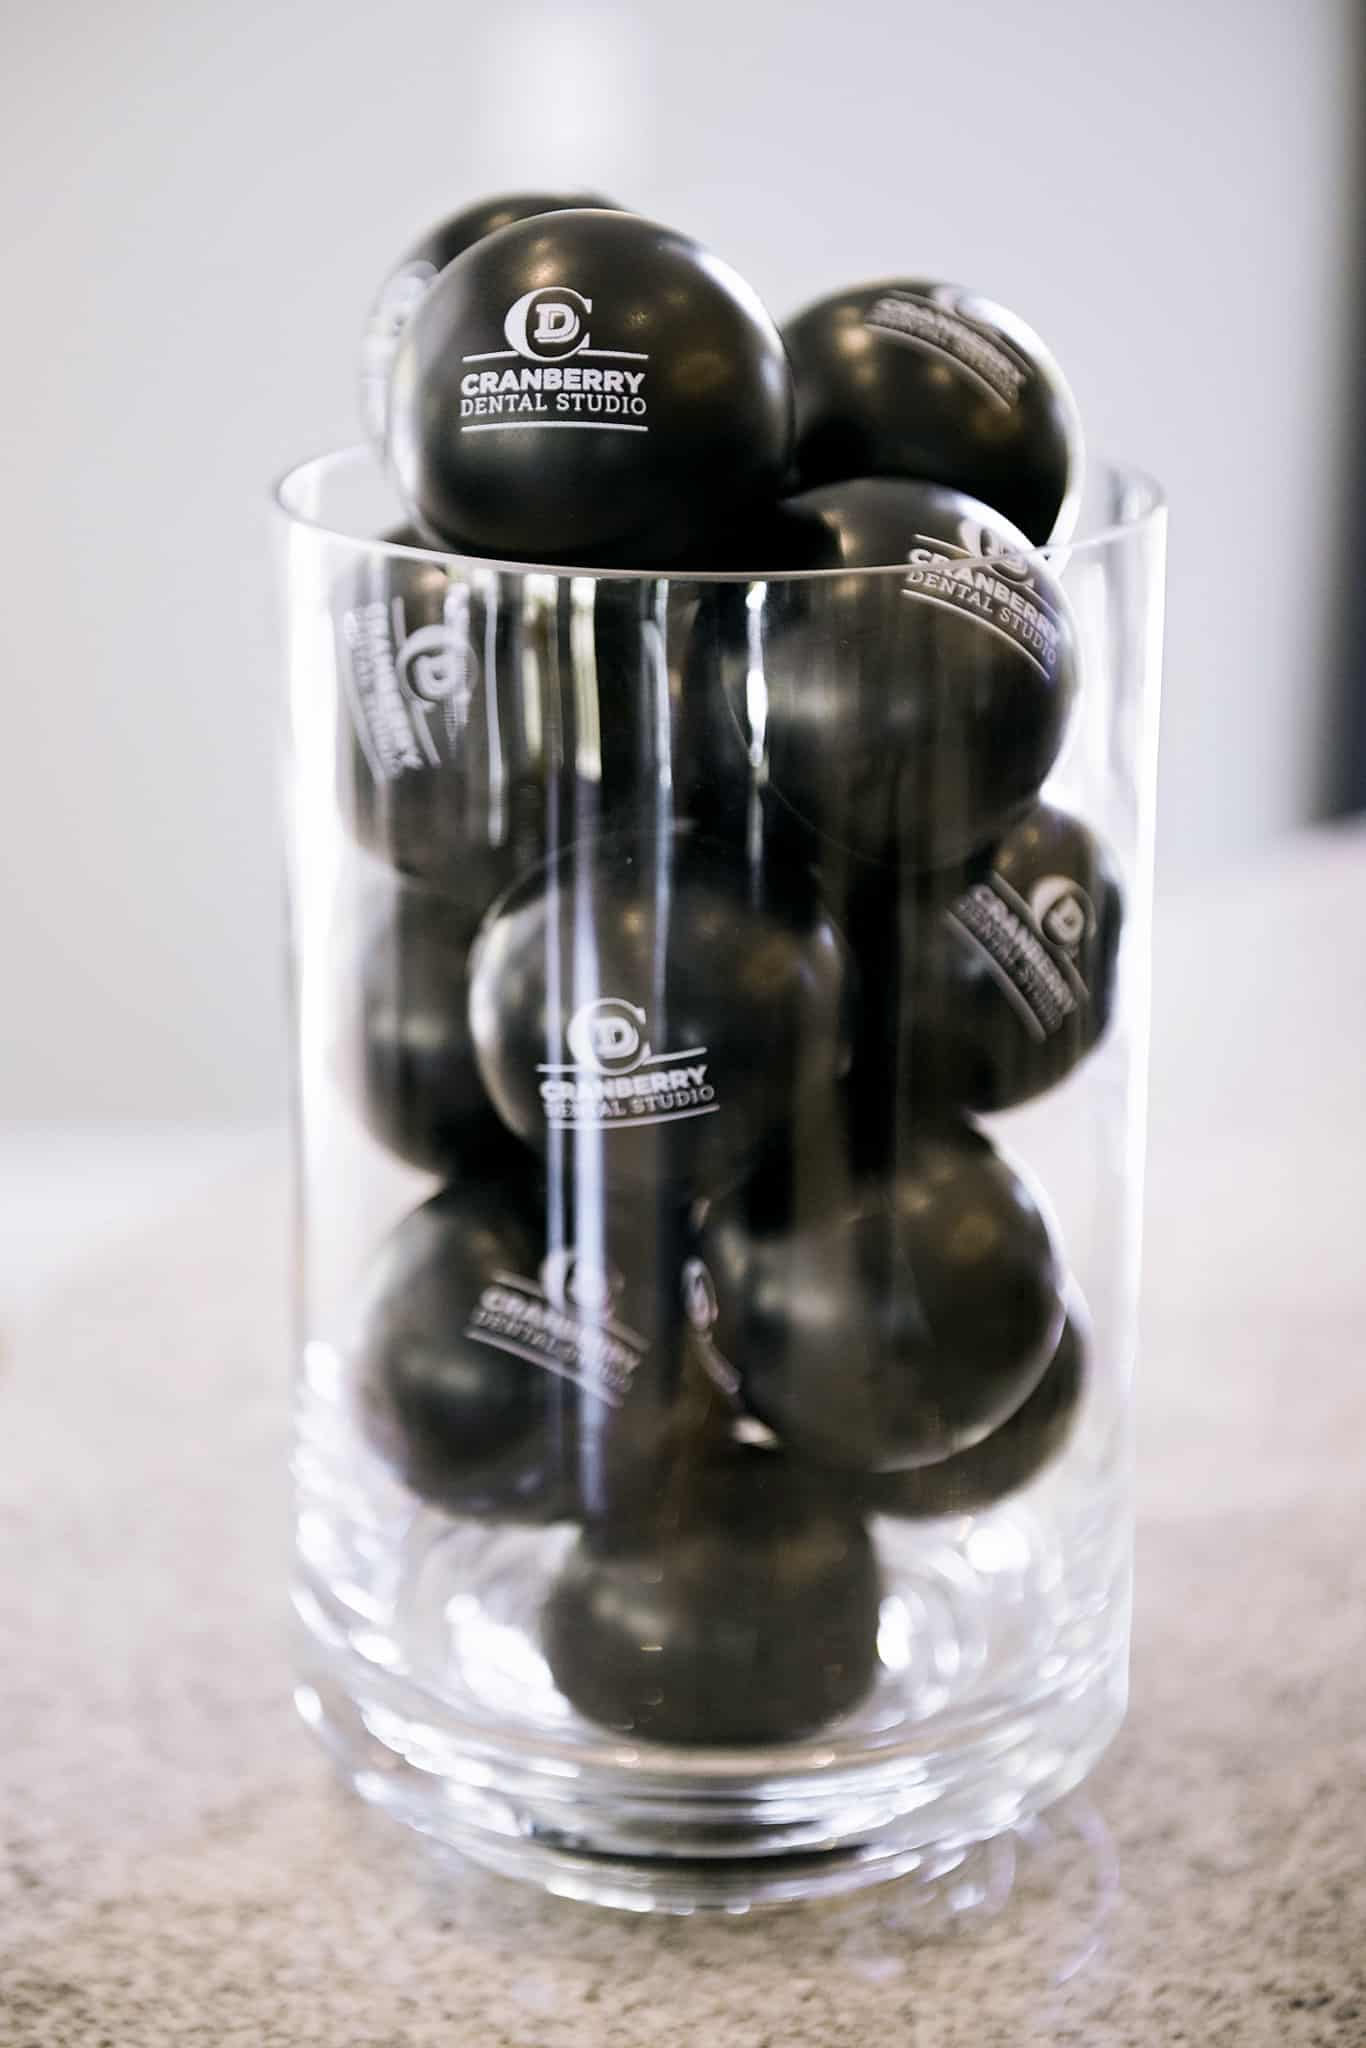 Cranberry Dental Studio | Stress Balls to Help Calm the Nerves